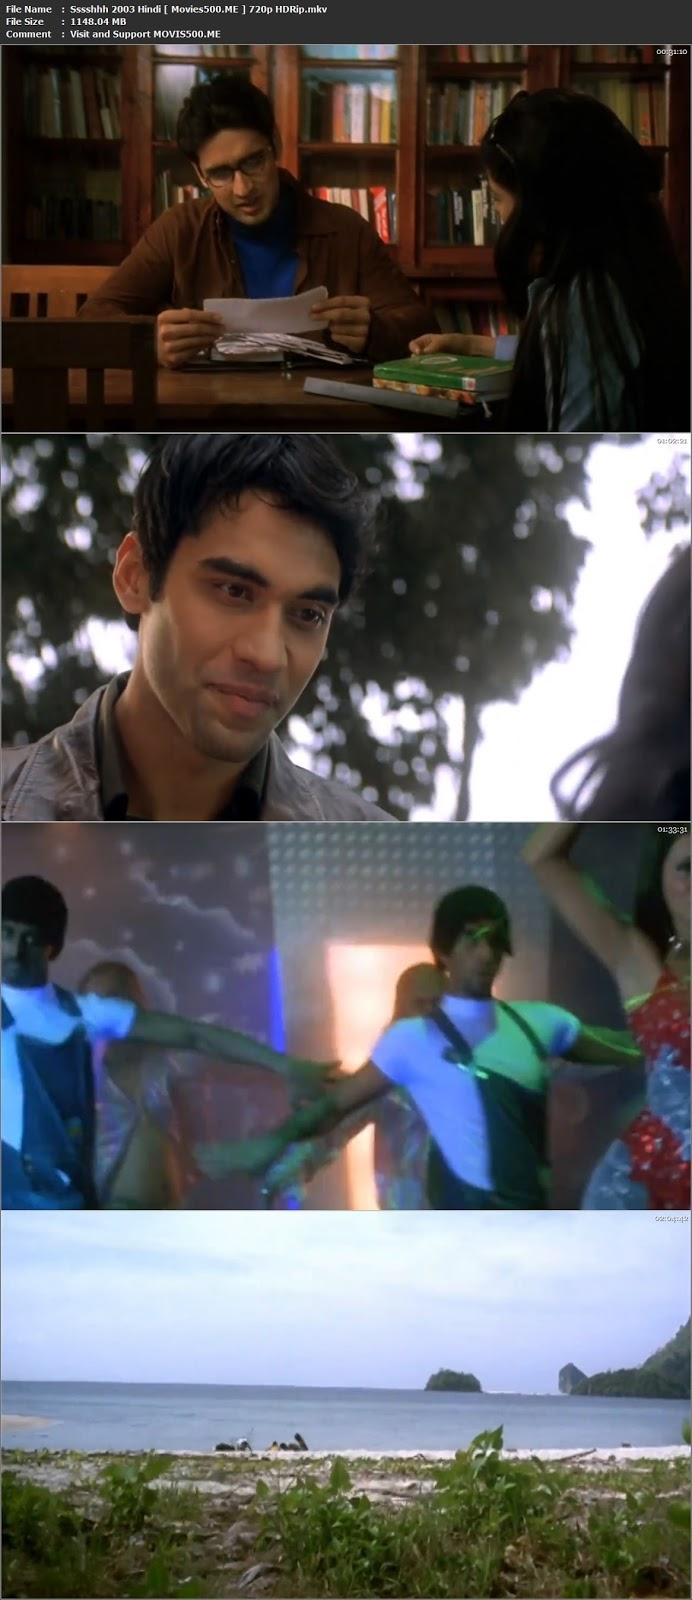 Sssshhh 2003 Hindi Full Movie HDRip 720p 1GB